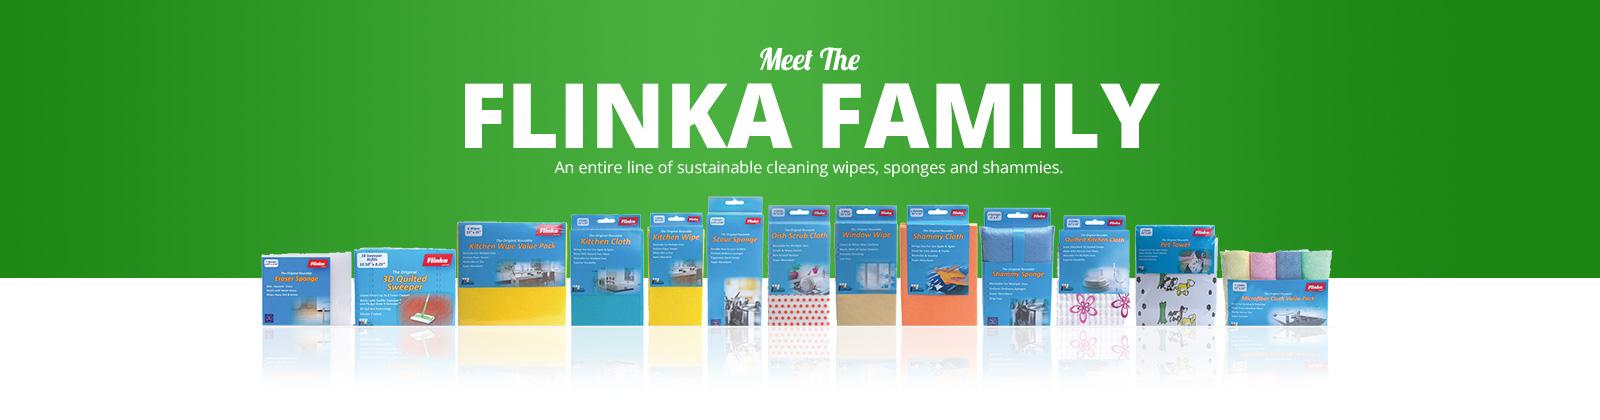 Flinka Family